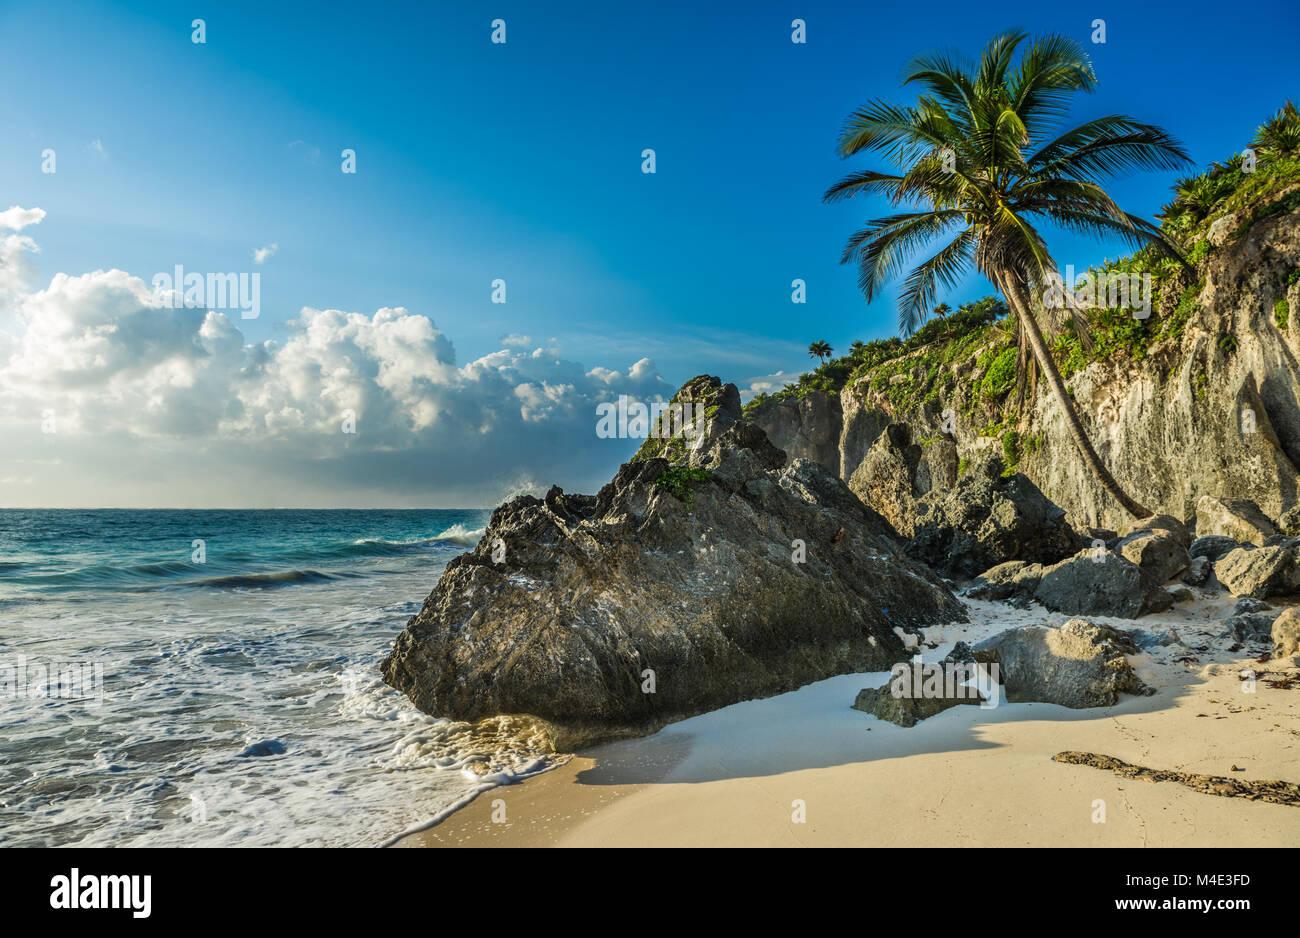 Karibik-Strand mit Kokospalmen, Tulum, Mexiko Stockbild